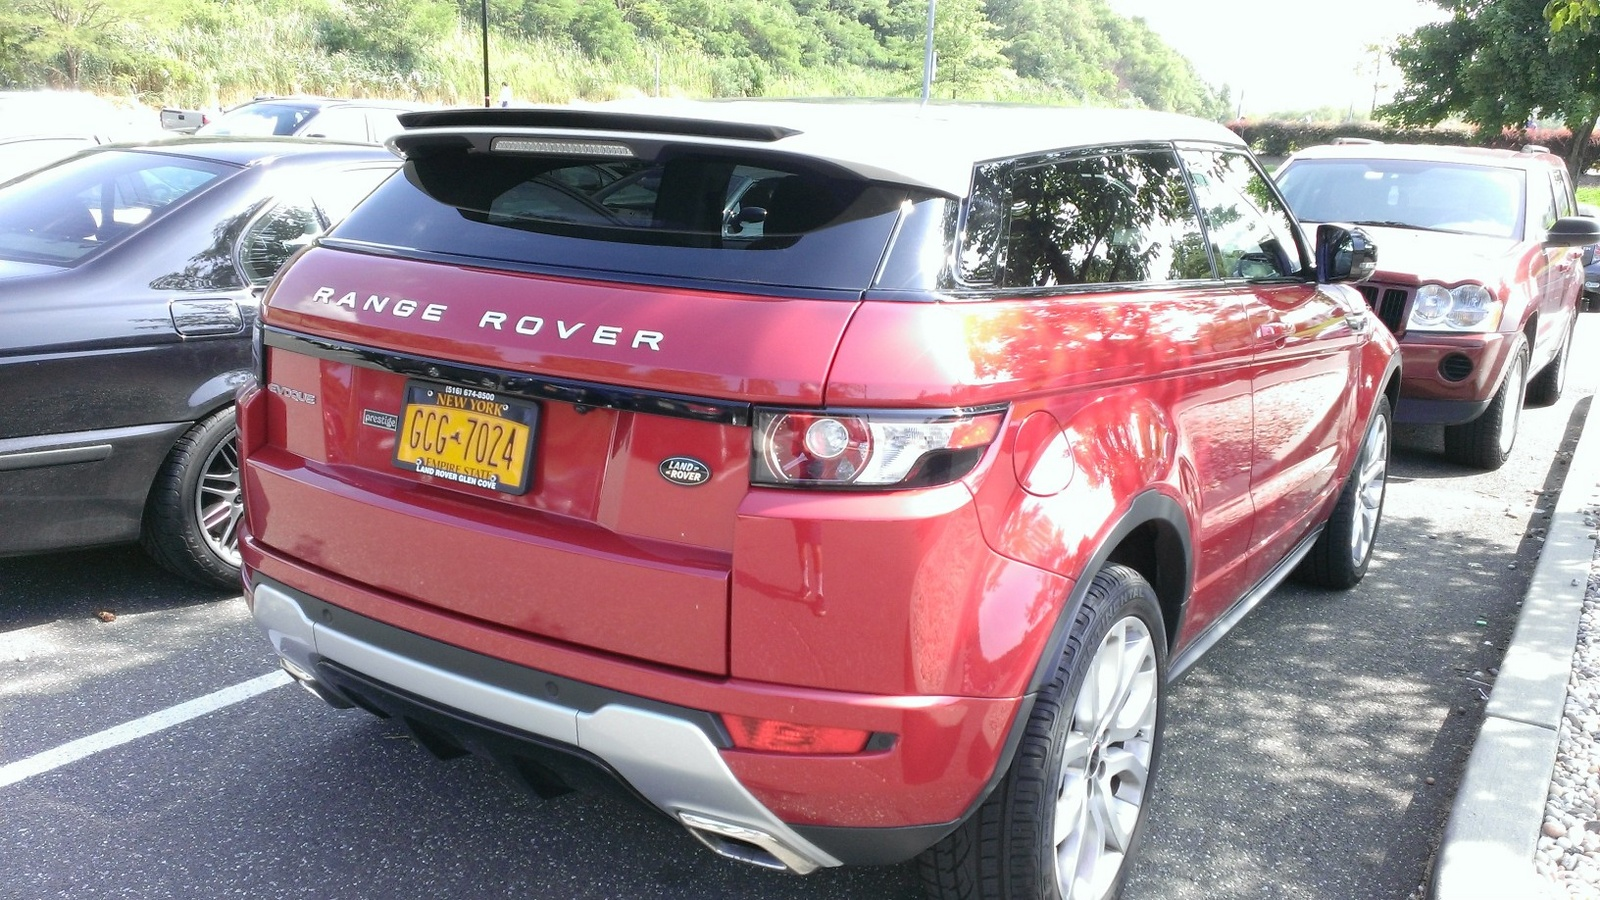 2012 land rover range rover evoque pictures cargurus. Black Bedroom Furniture Sets. Home Design Ideas